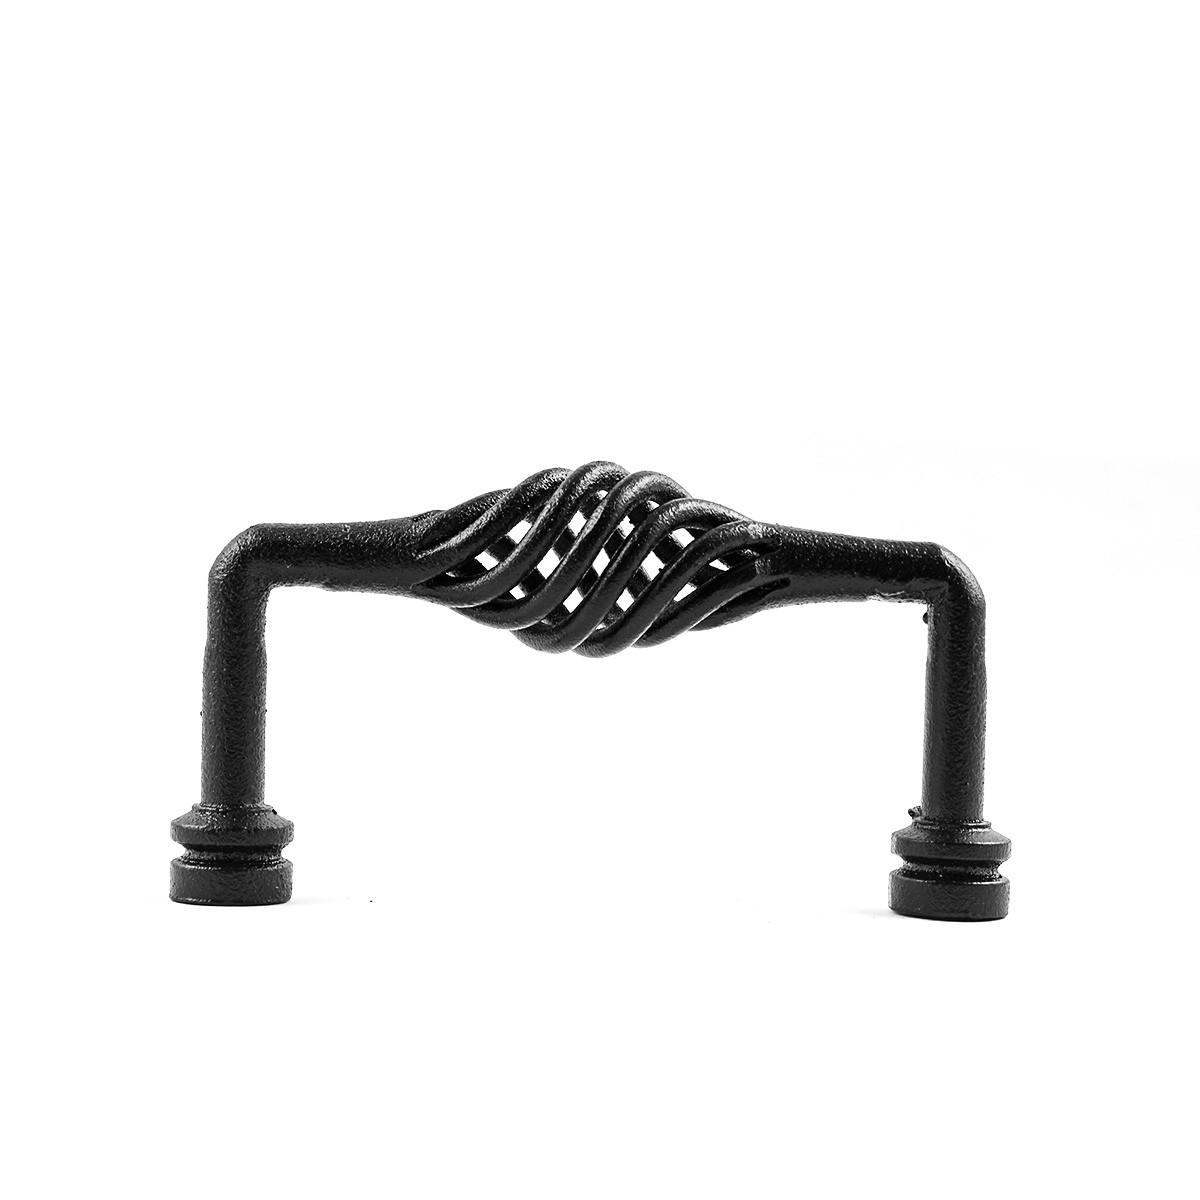 Black Wrought Iron Birdcage Drawer Handle Cabinet Pull 5 Set of 10 Furniture Hardware Cabinet Pull Cabinet Hardware